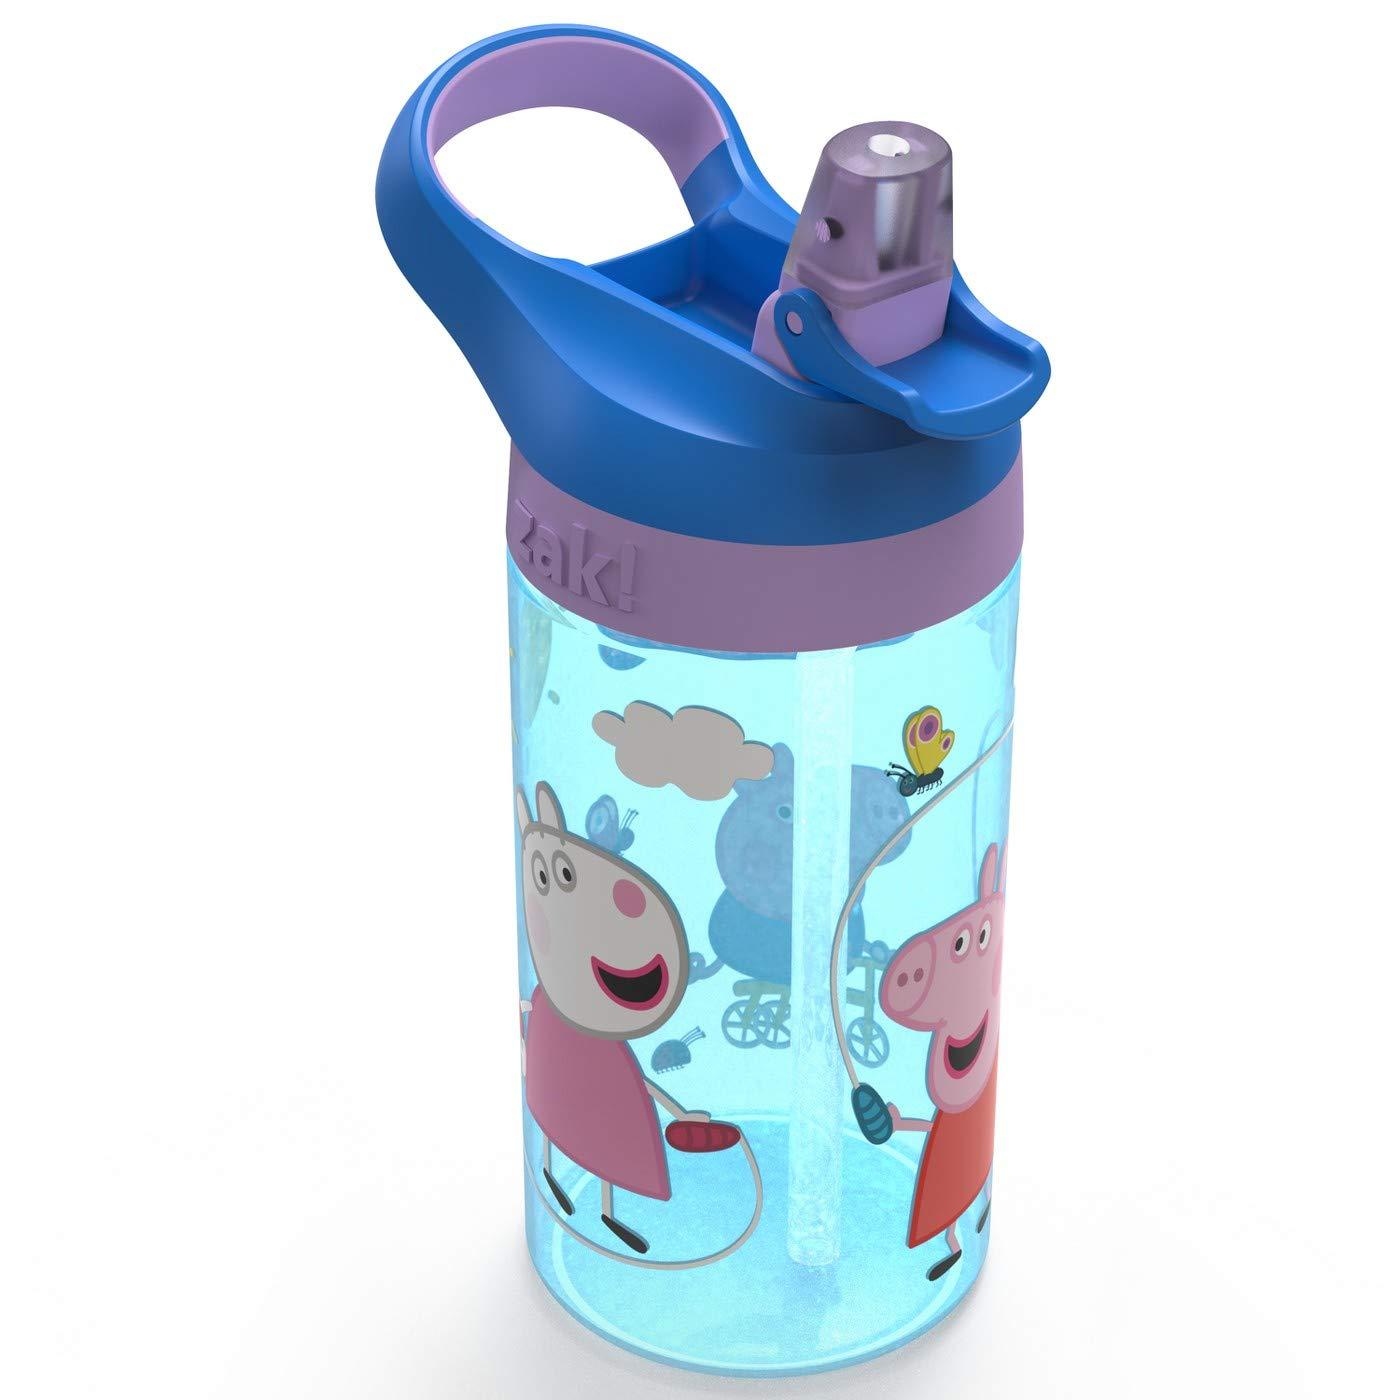 Peppa Pig Zak Designs 16oz Plastic Water Bottle Blue//Purple